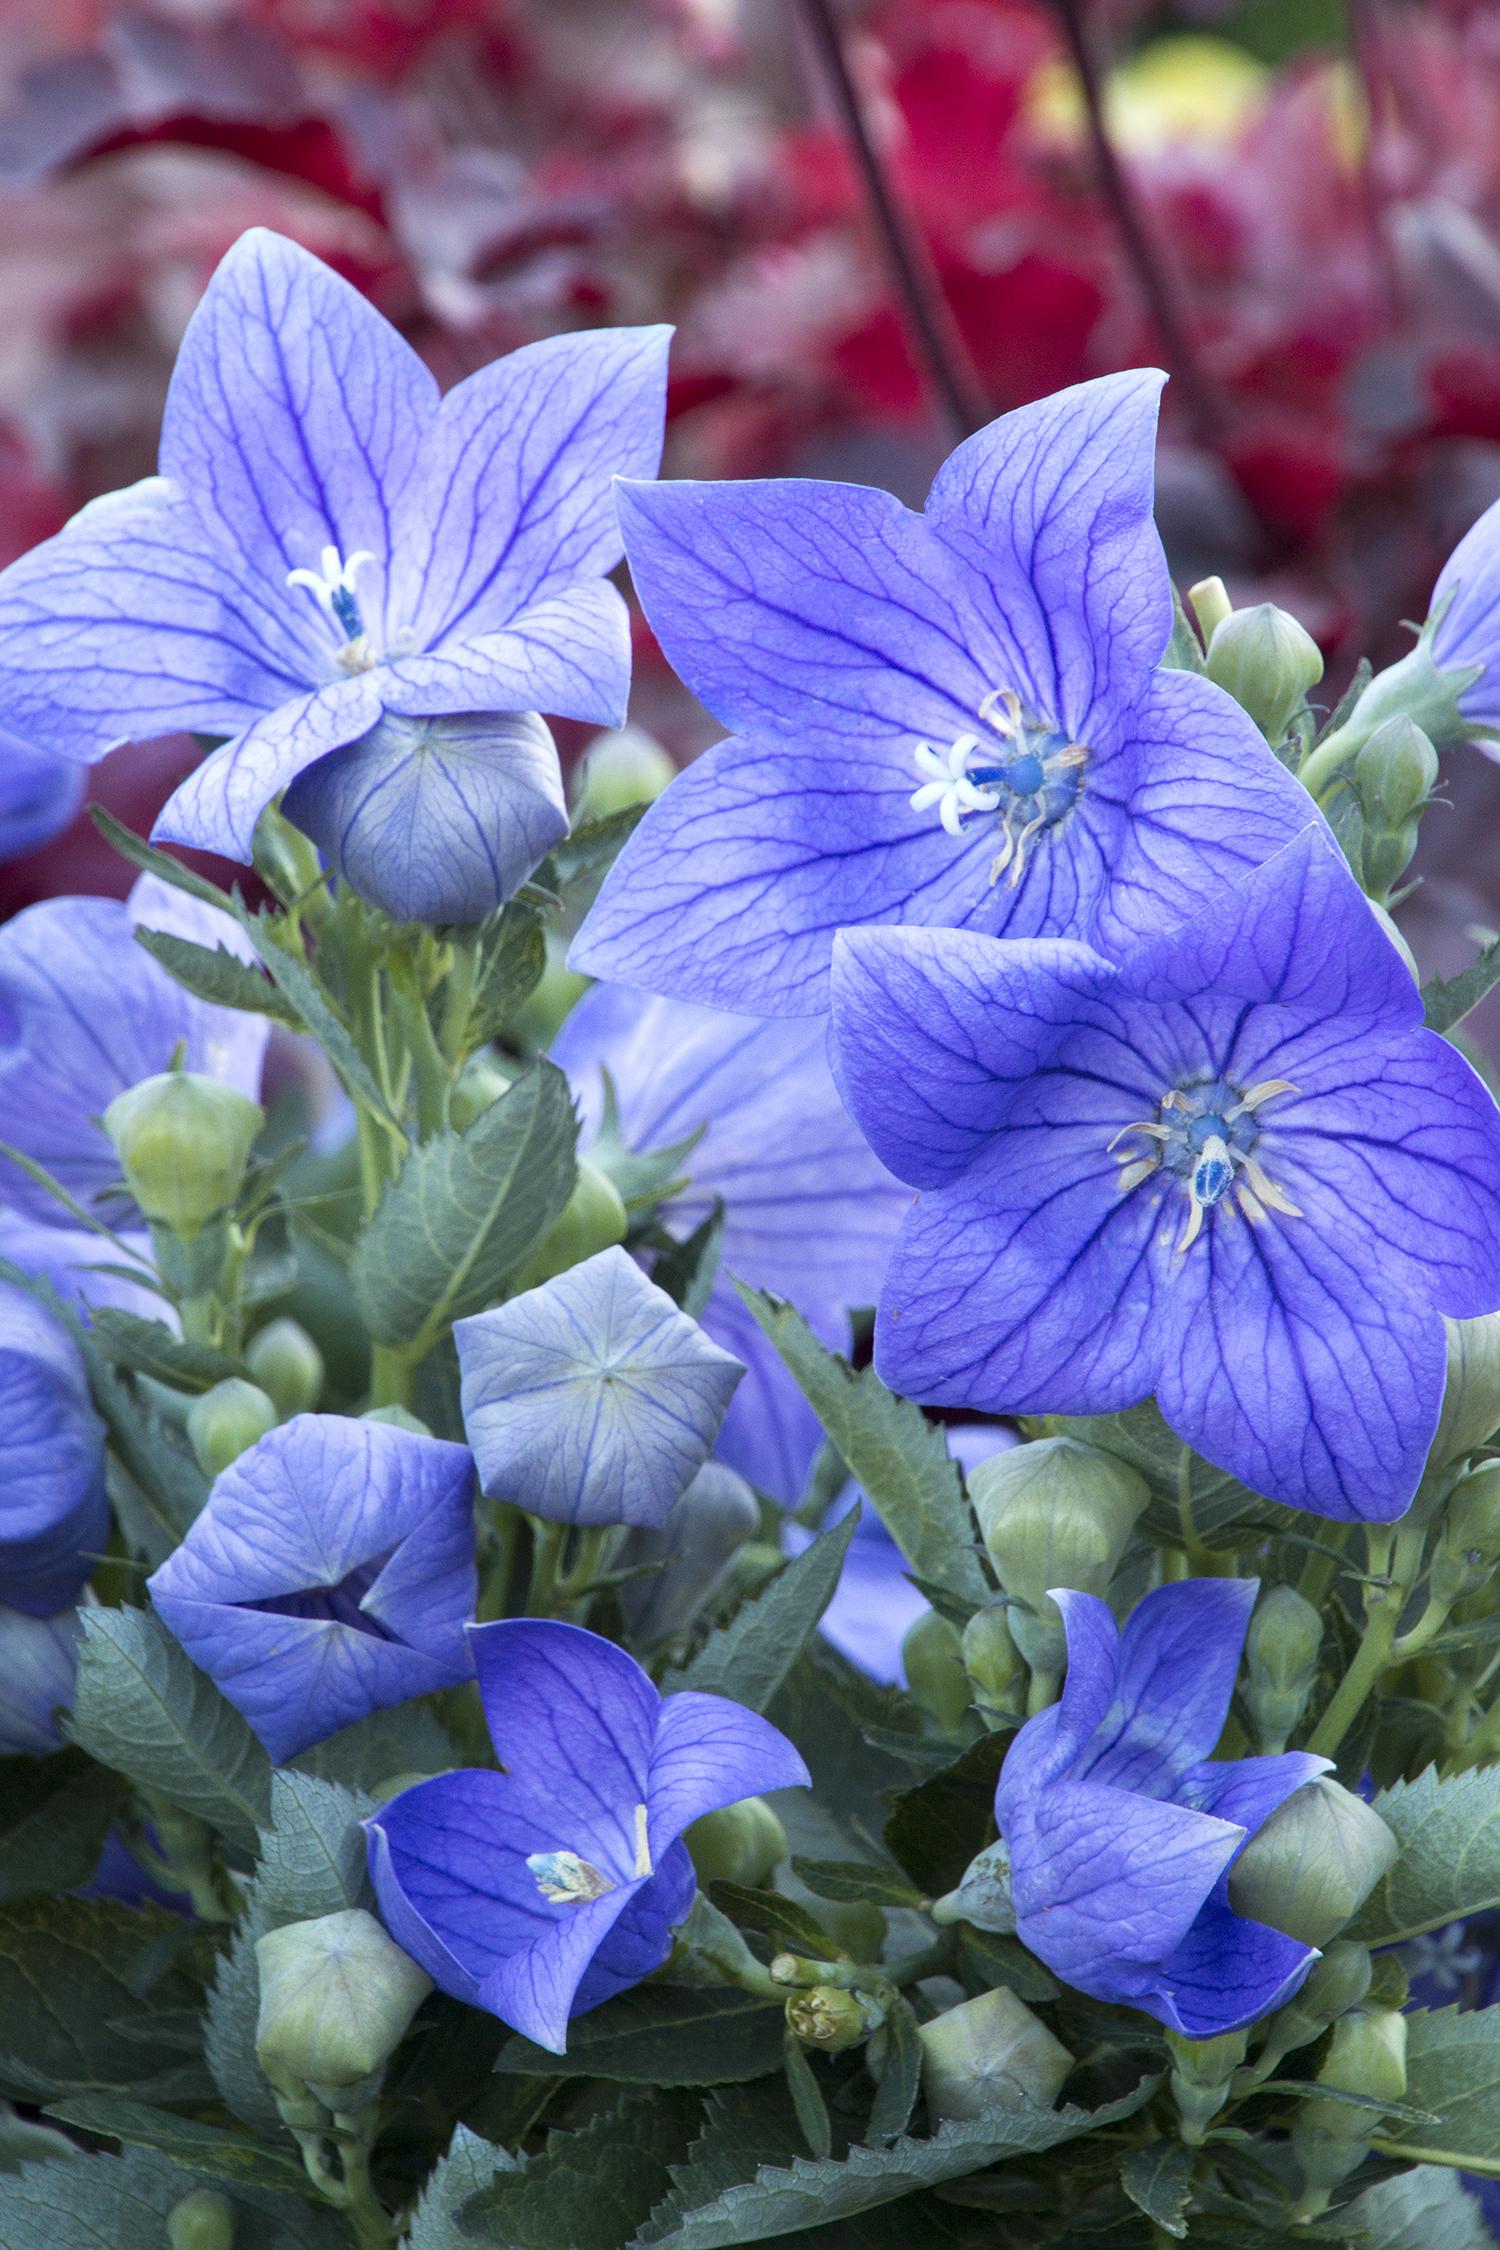 самый большой цветок платикодон фото благодаря